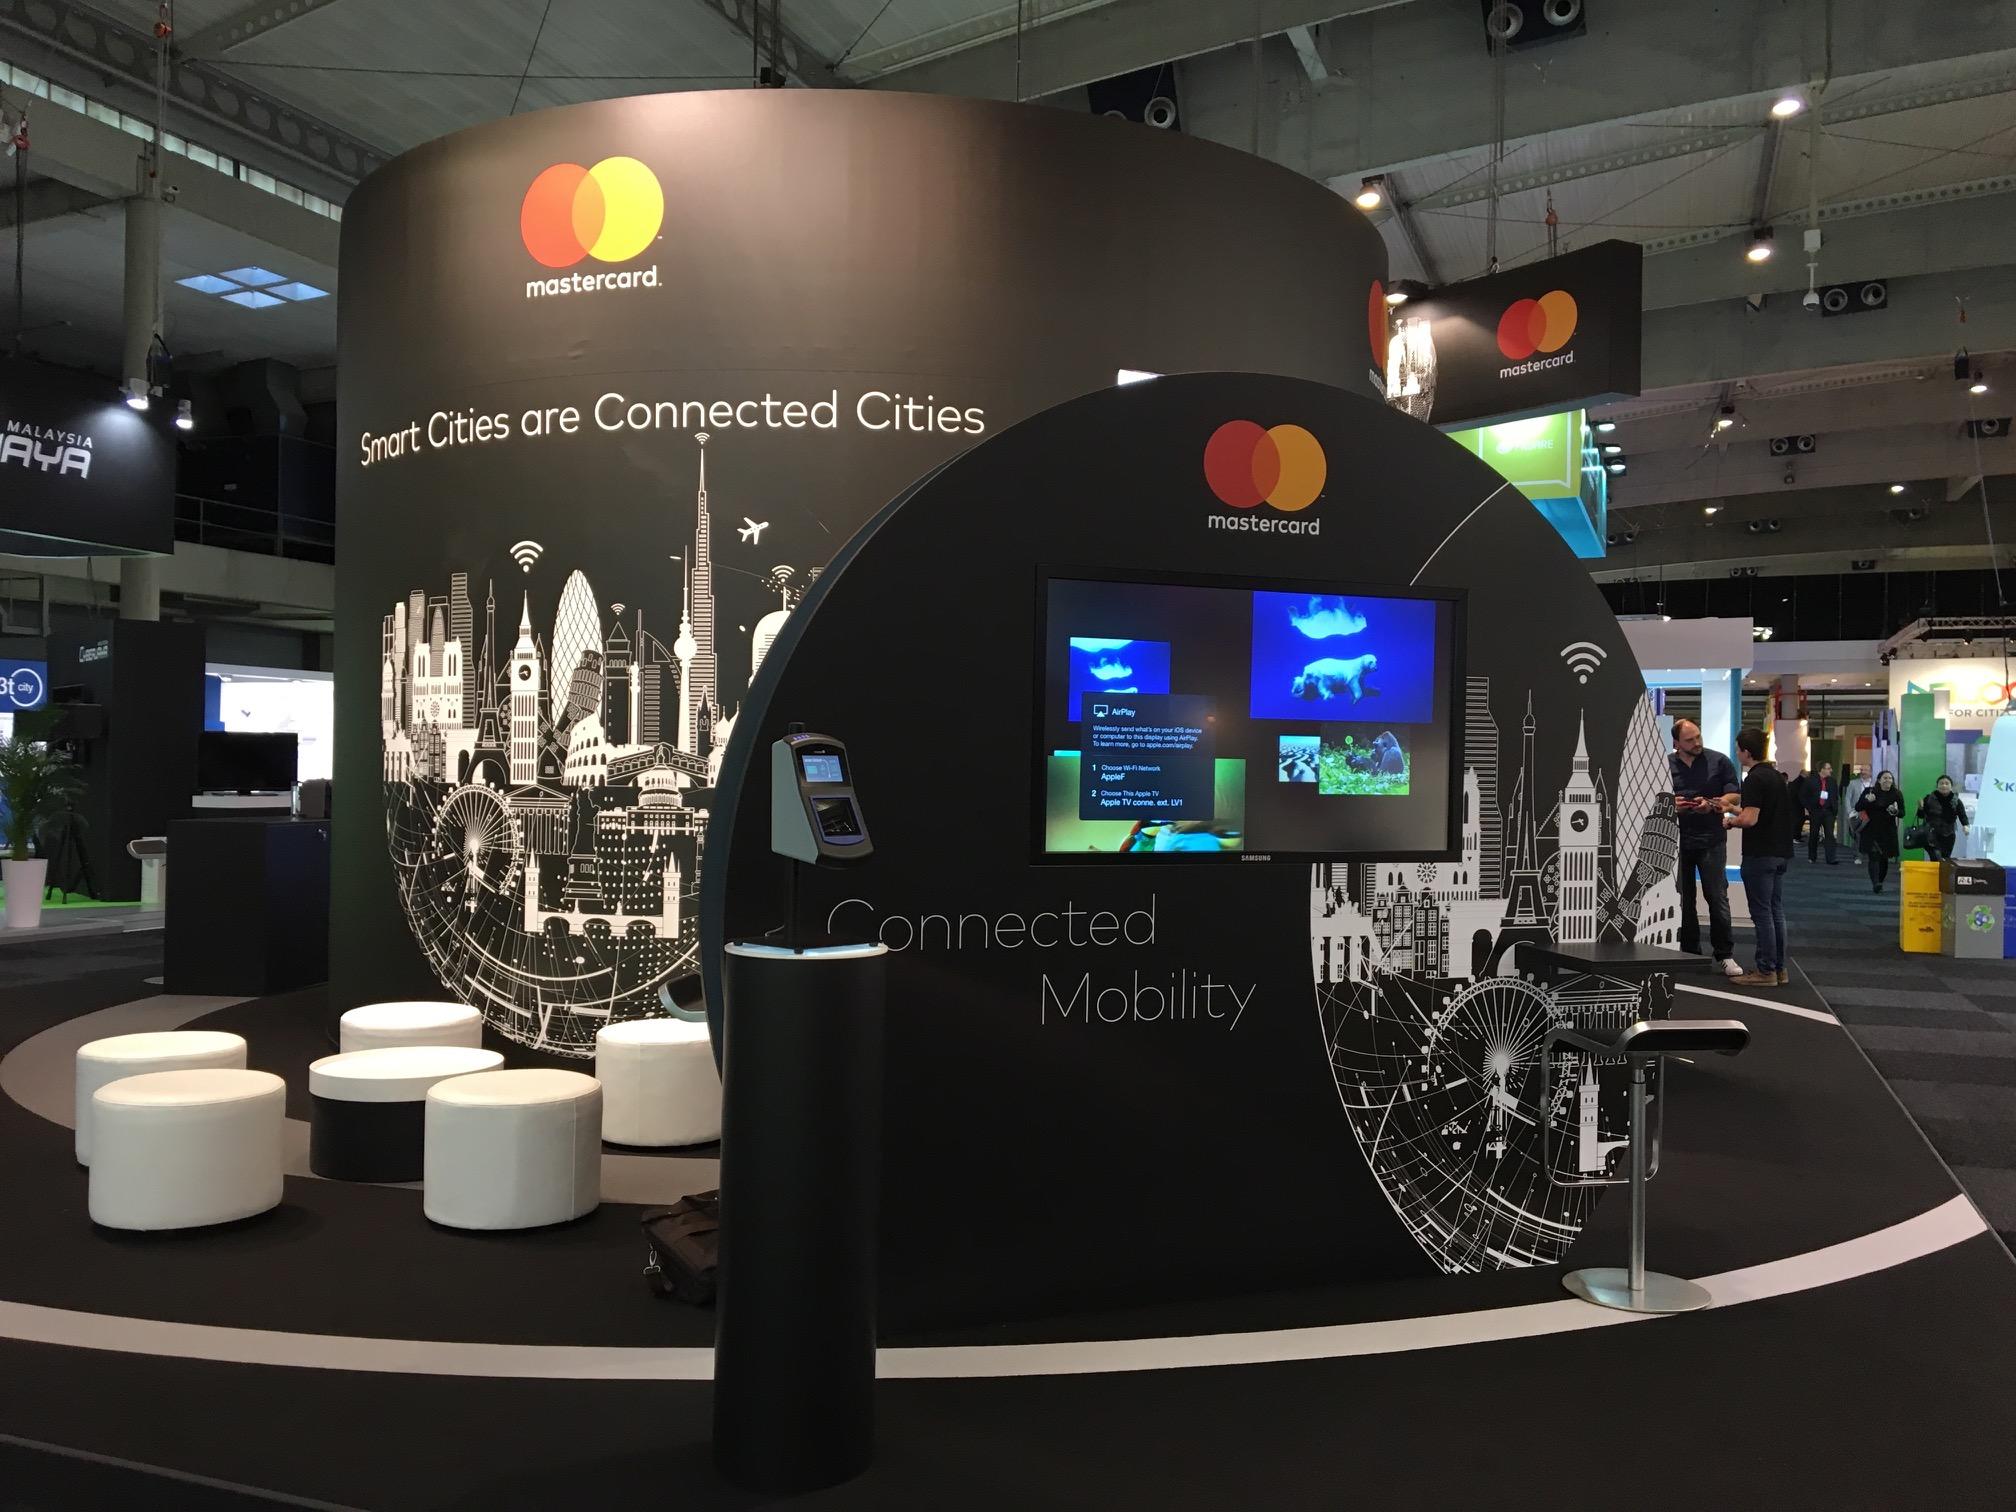 mastercard-smart-city-barcelona-2016-5